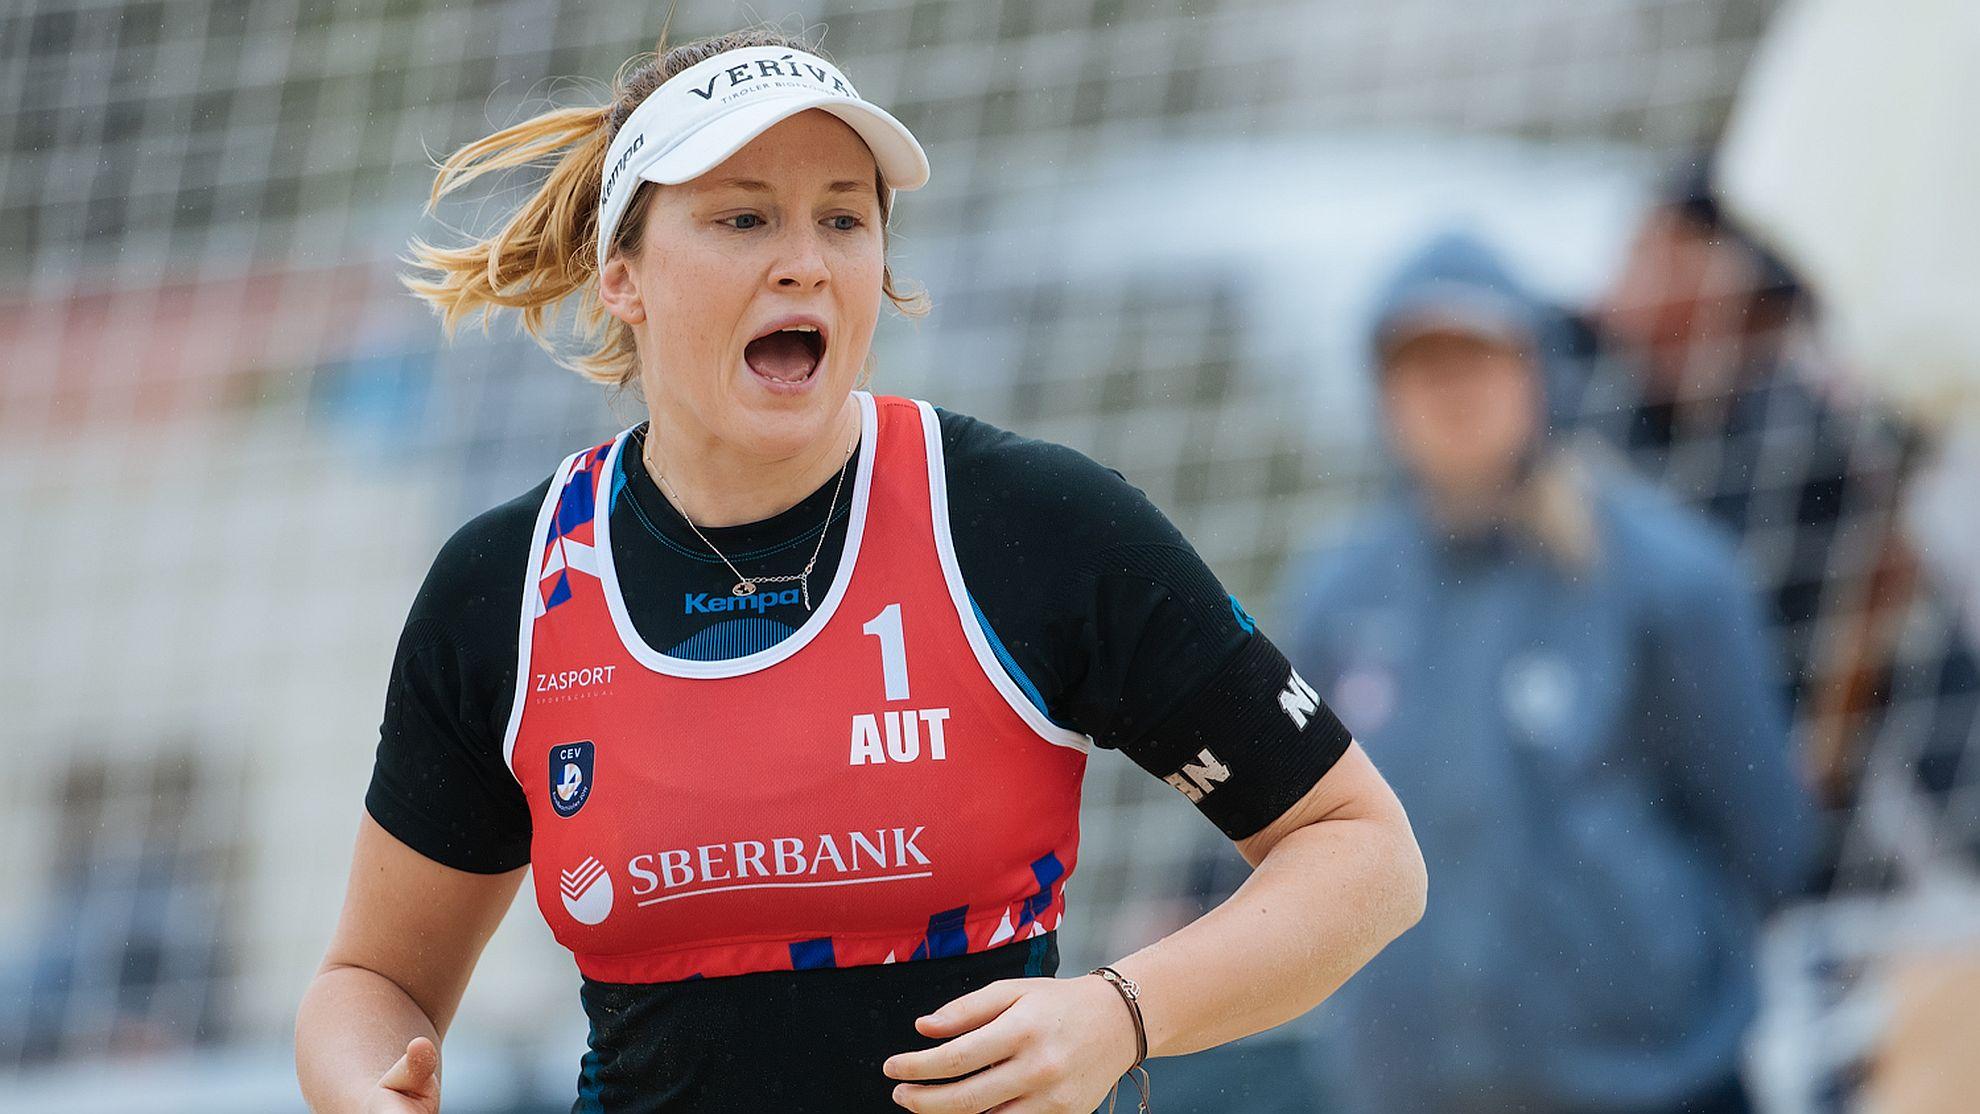 Katharina Schützenhöfer/Lena Plesiutschnig - FOTO © CEV